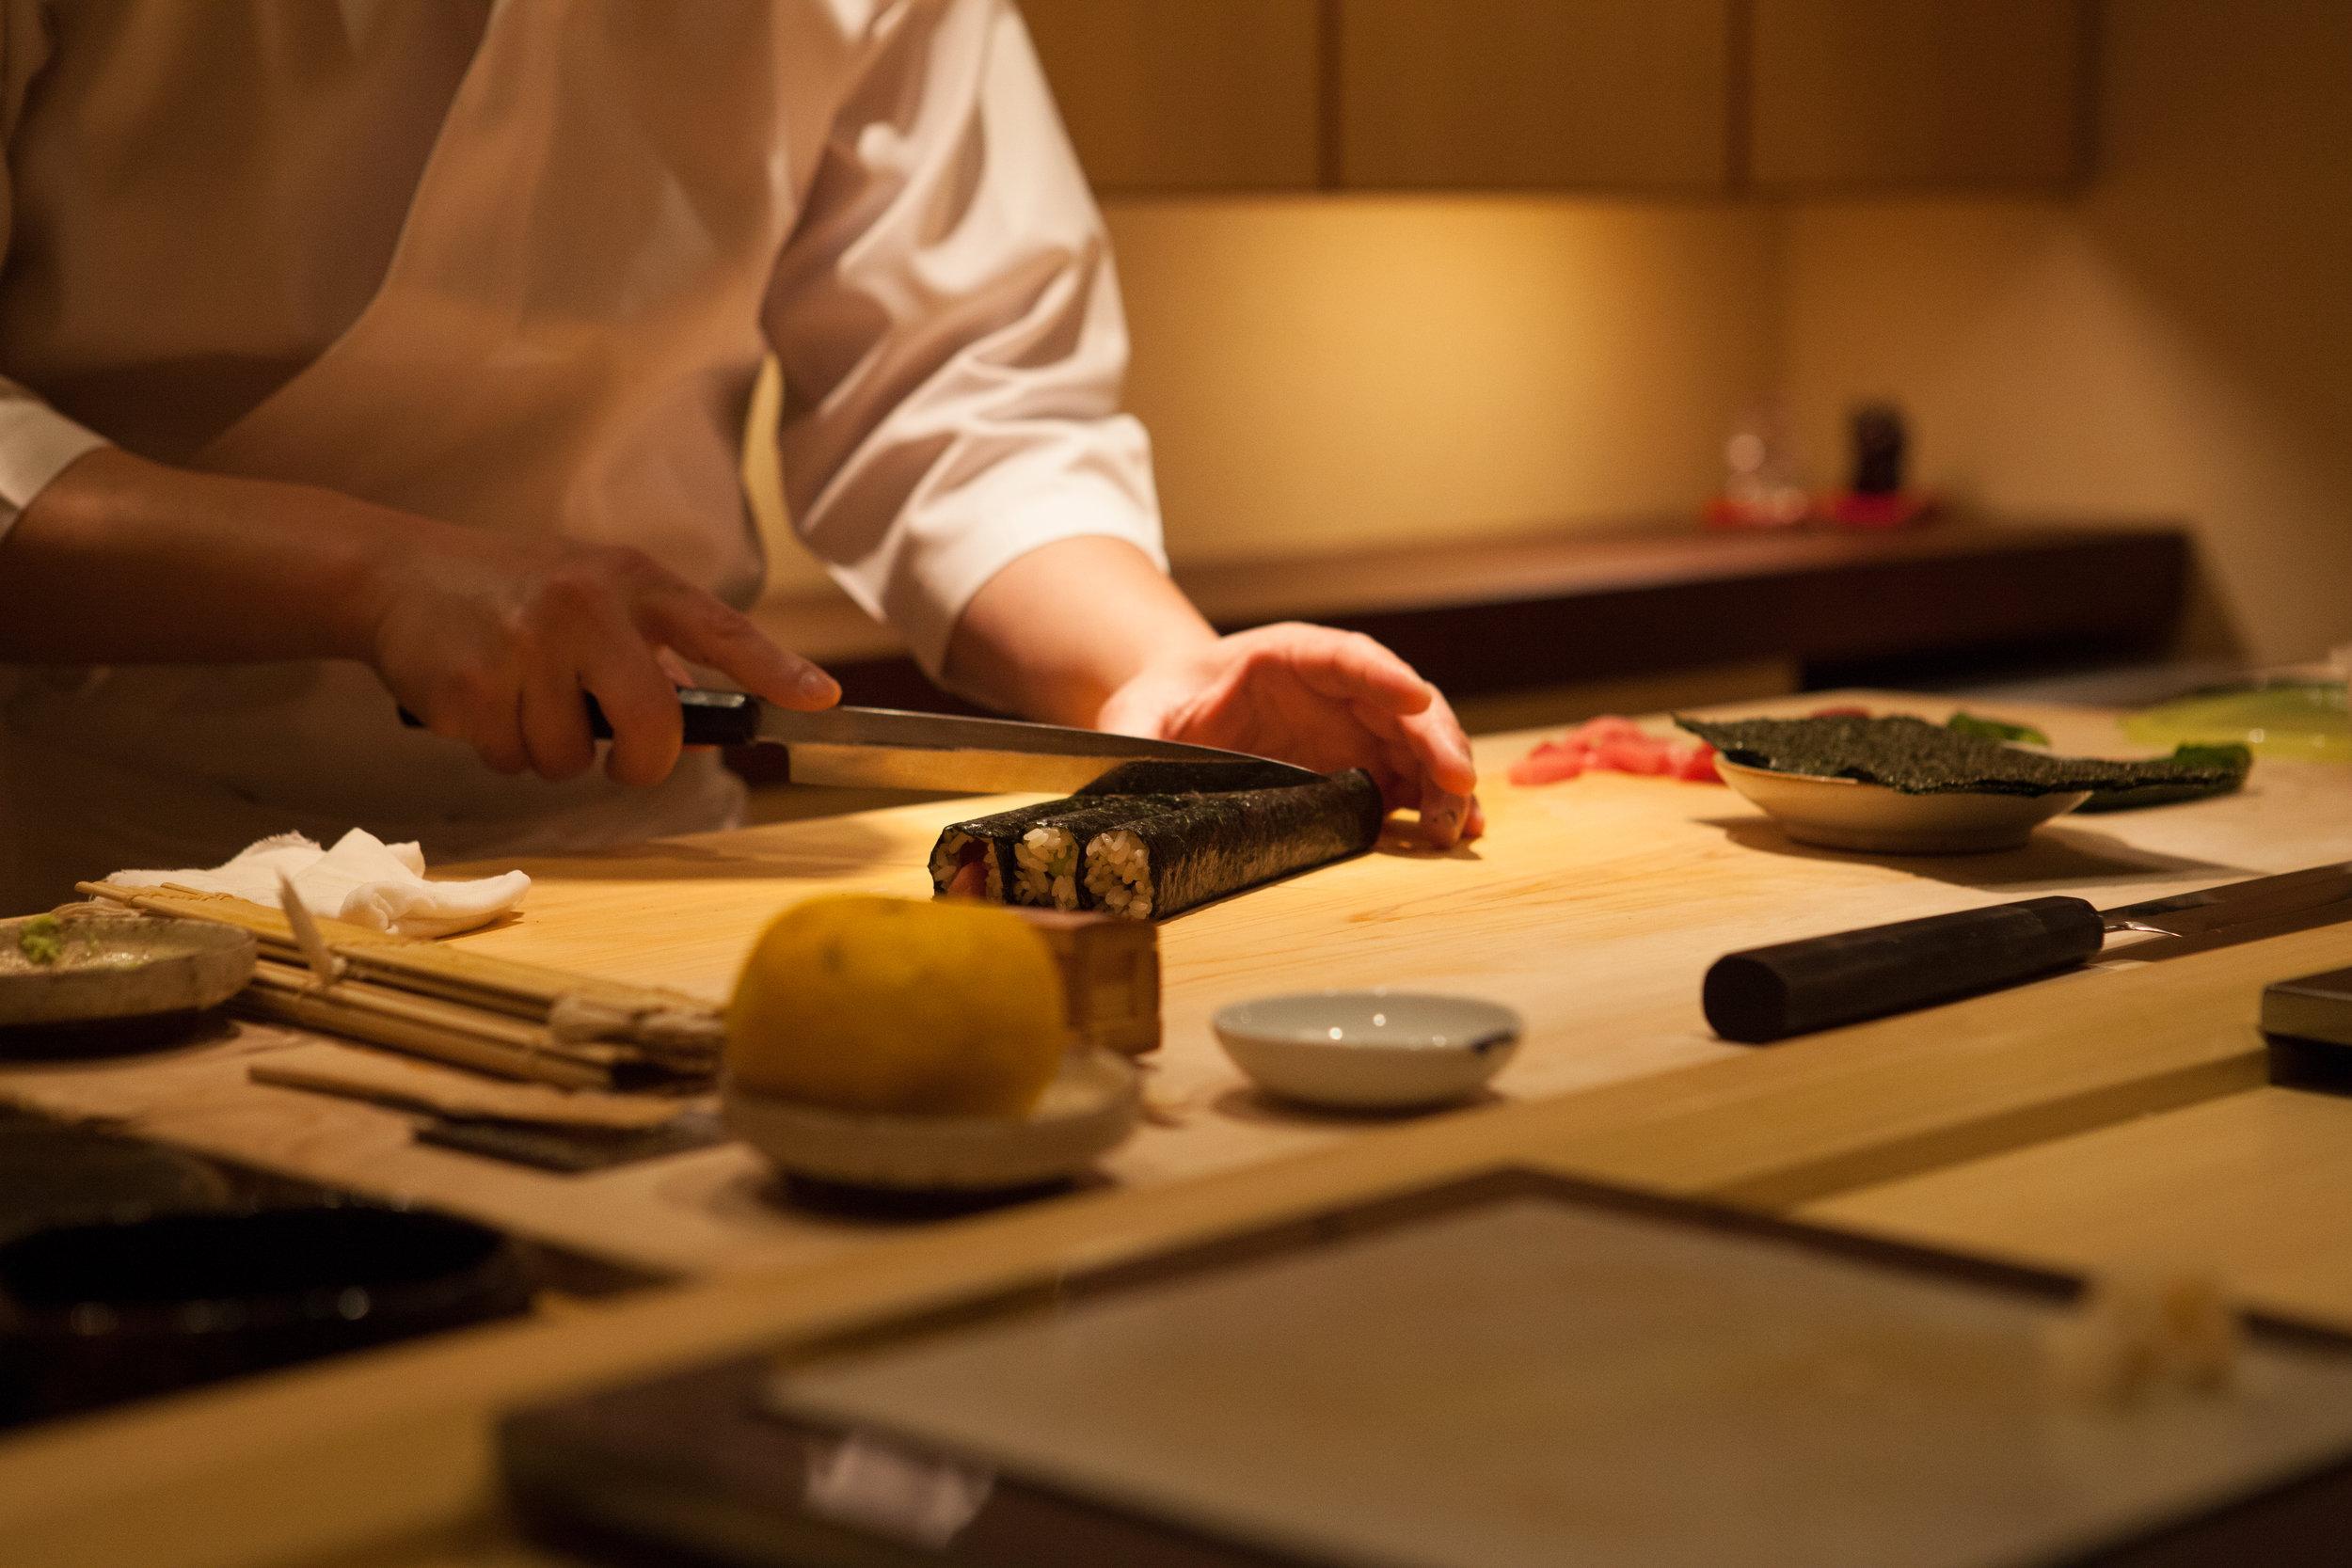 Gotta finish up with some delicious fatty tuna rolls!